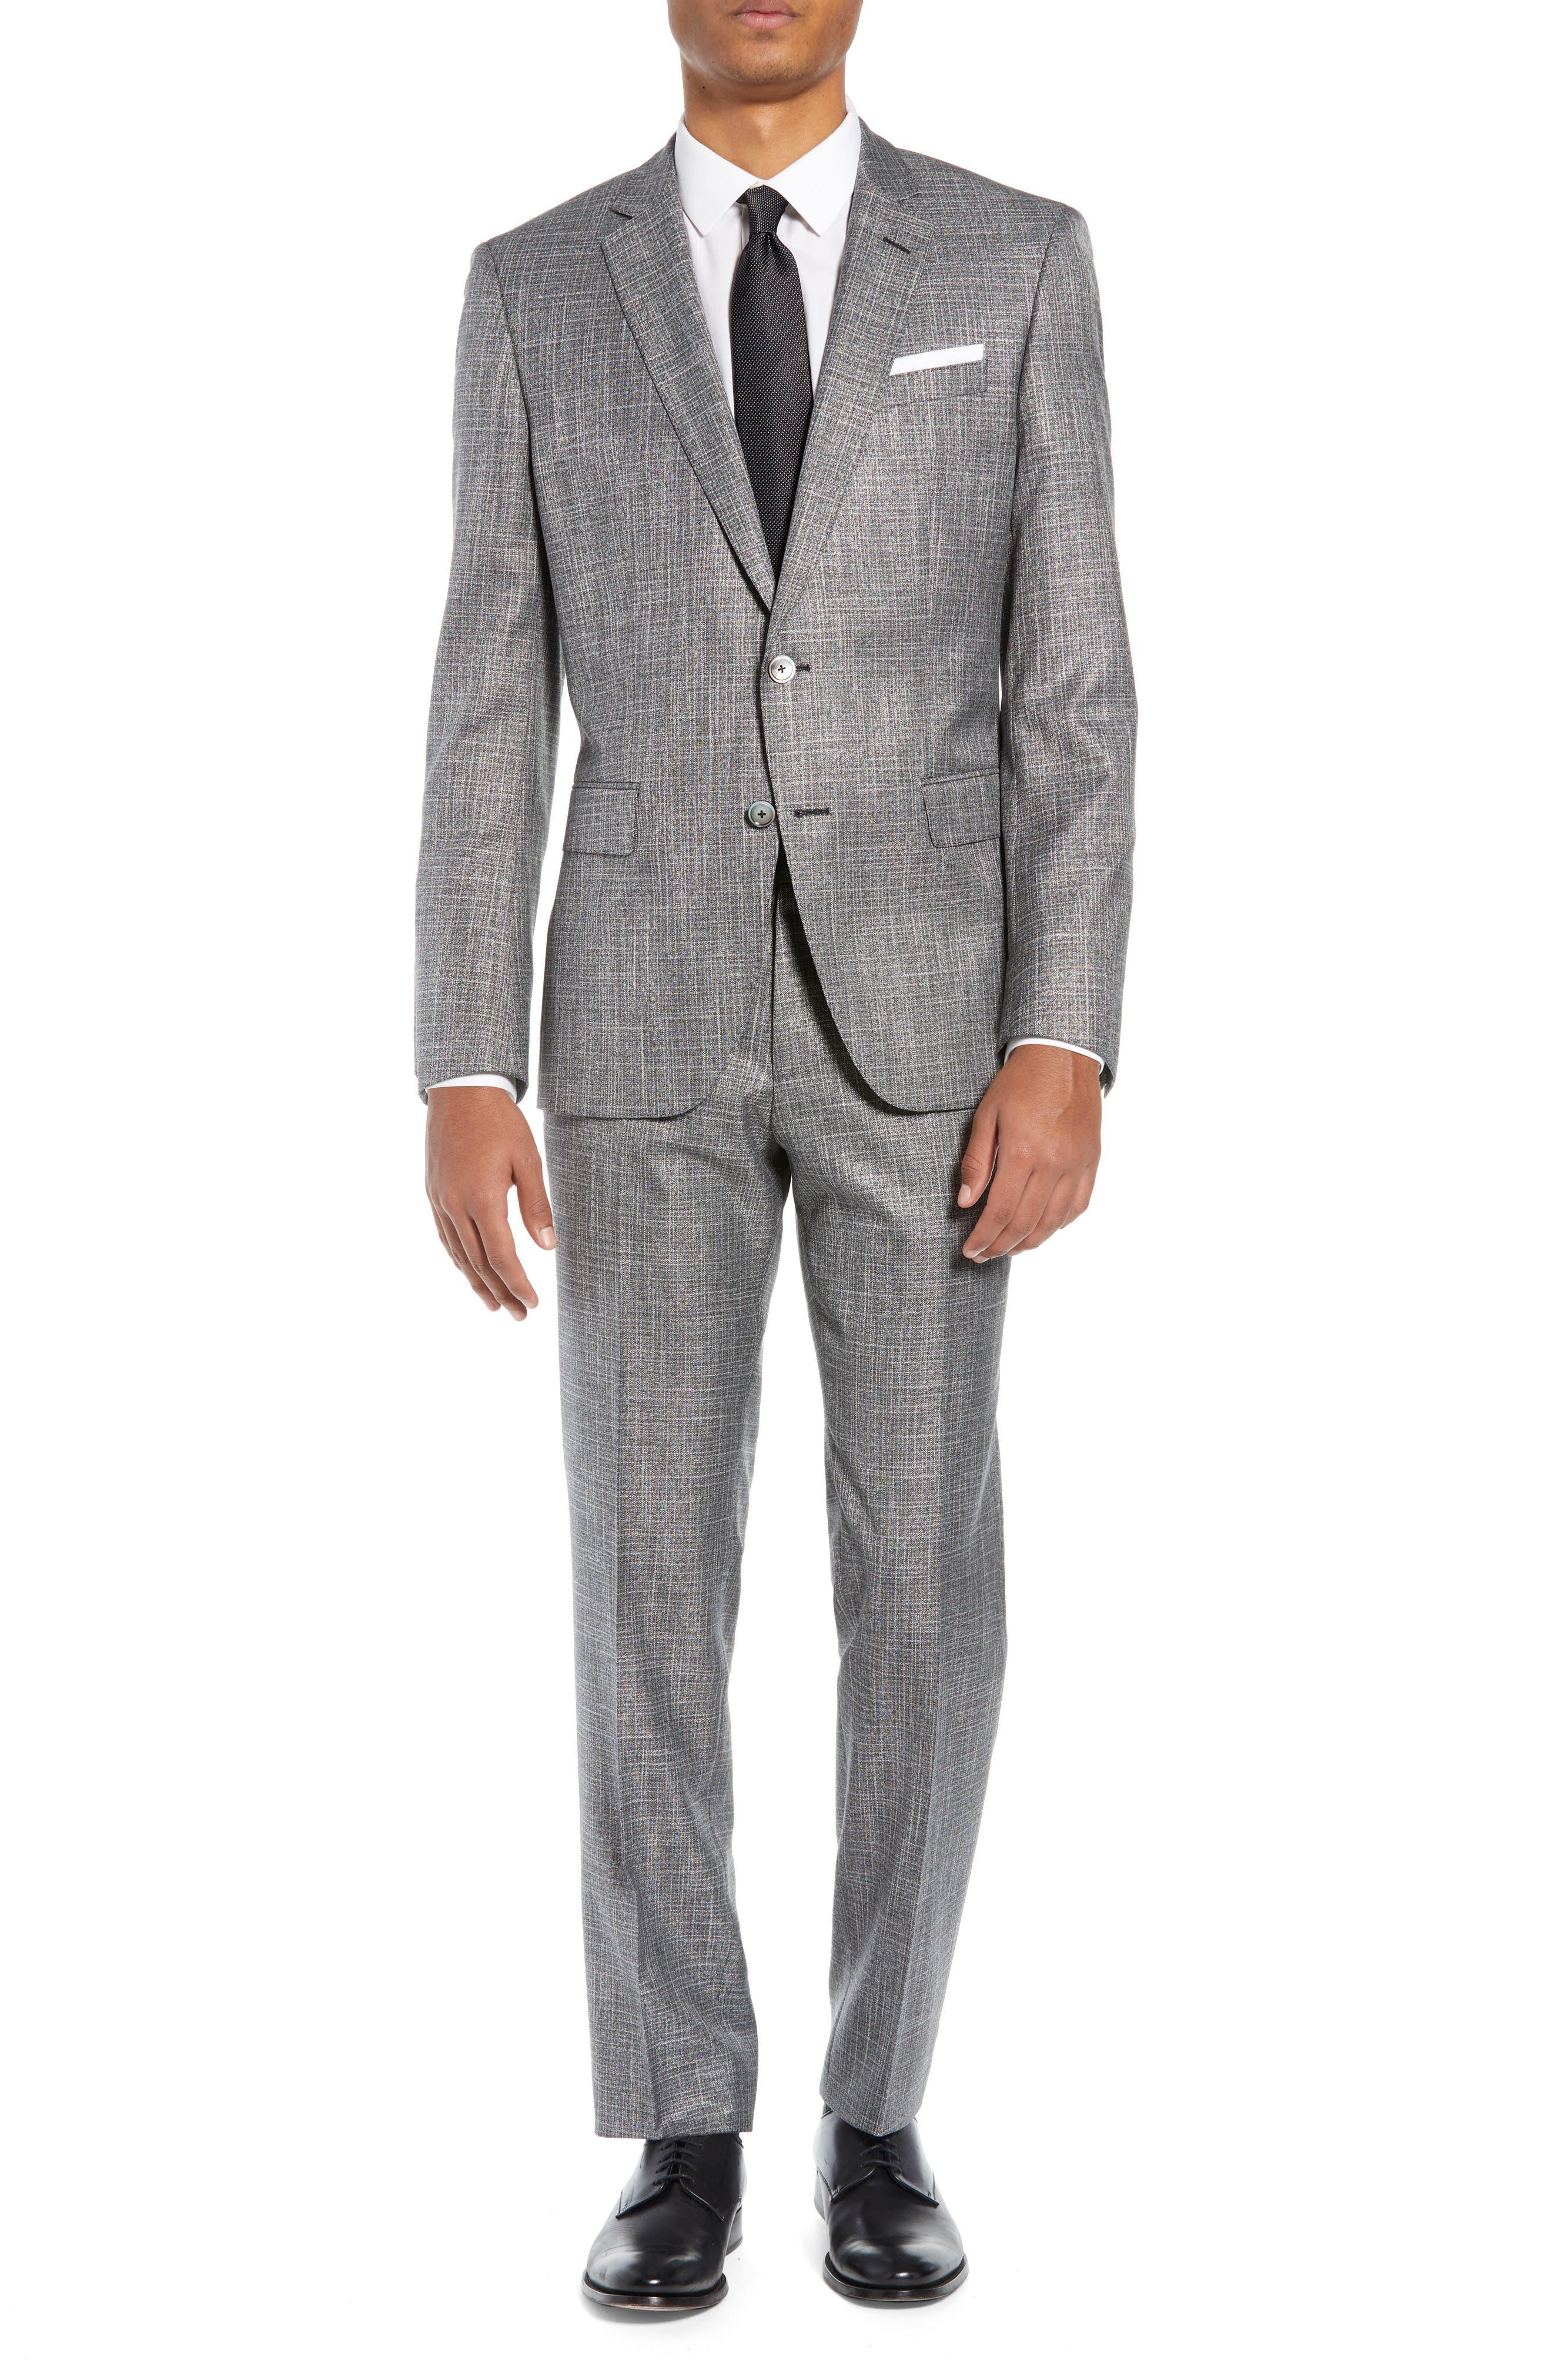 Hutson/Gander Trim Fit Solid Wool Blend Suit,                             Main thumbnail 1, color,                             MEDIUM GREY